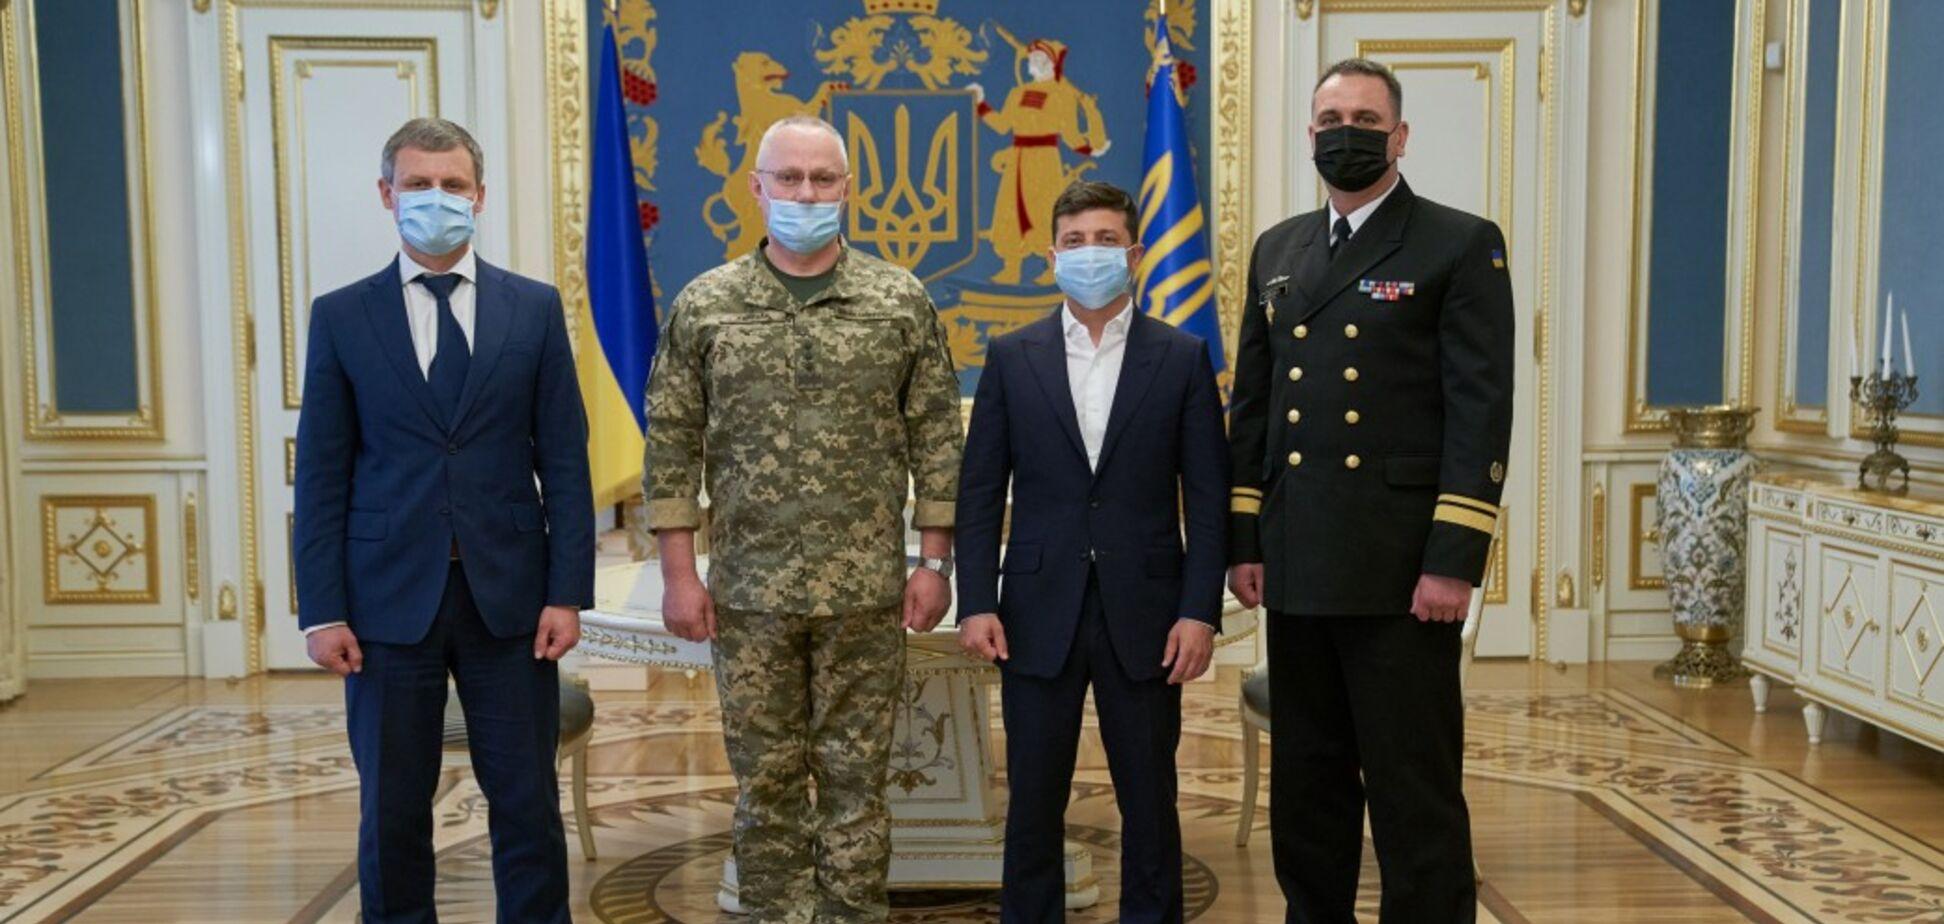 Алексей Неижпапа стал командующим Военно-Морских сил